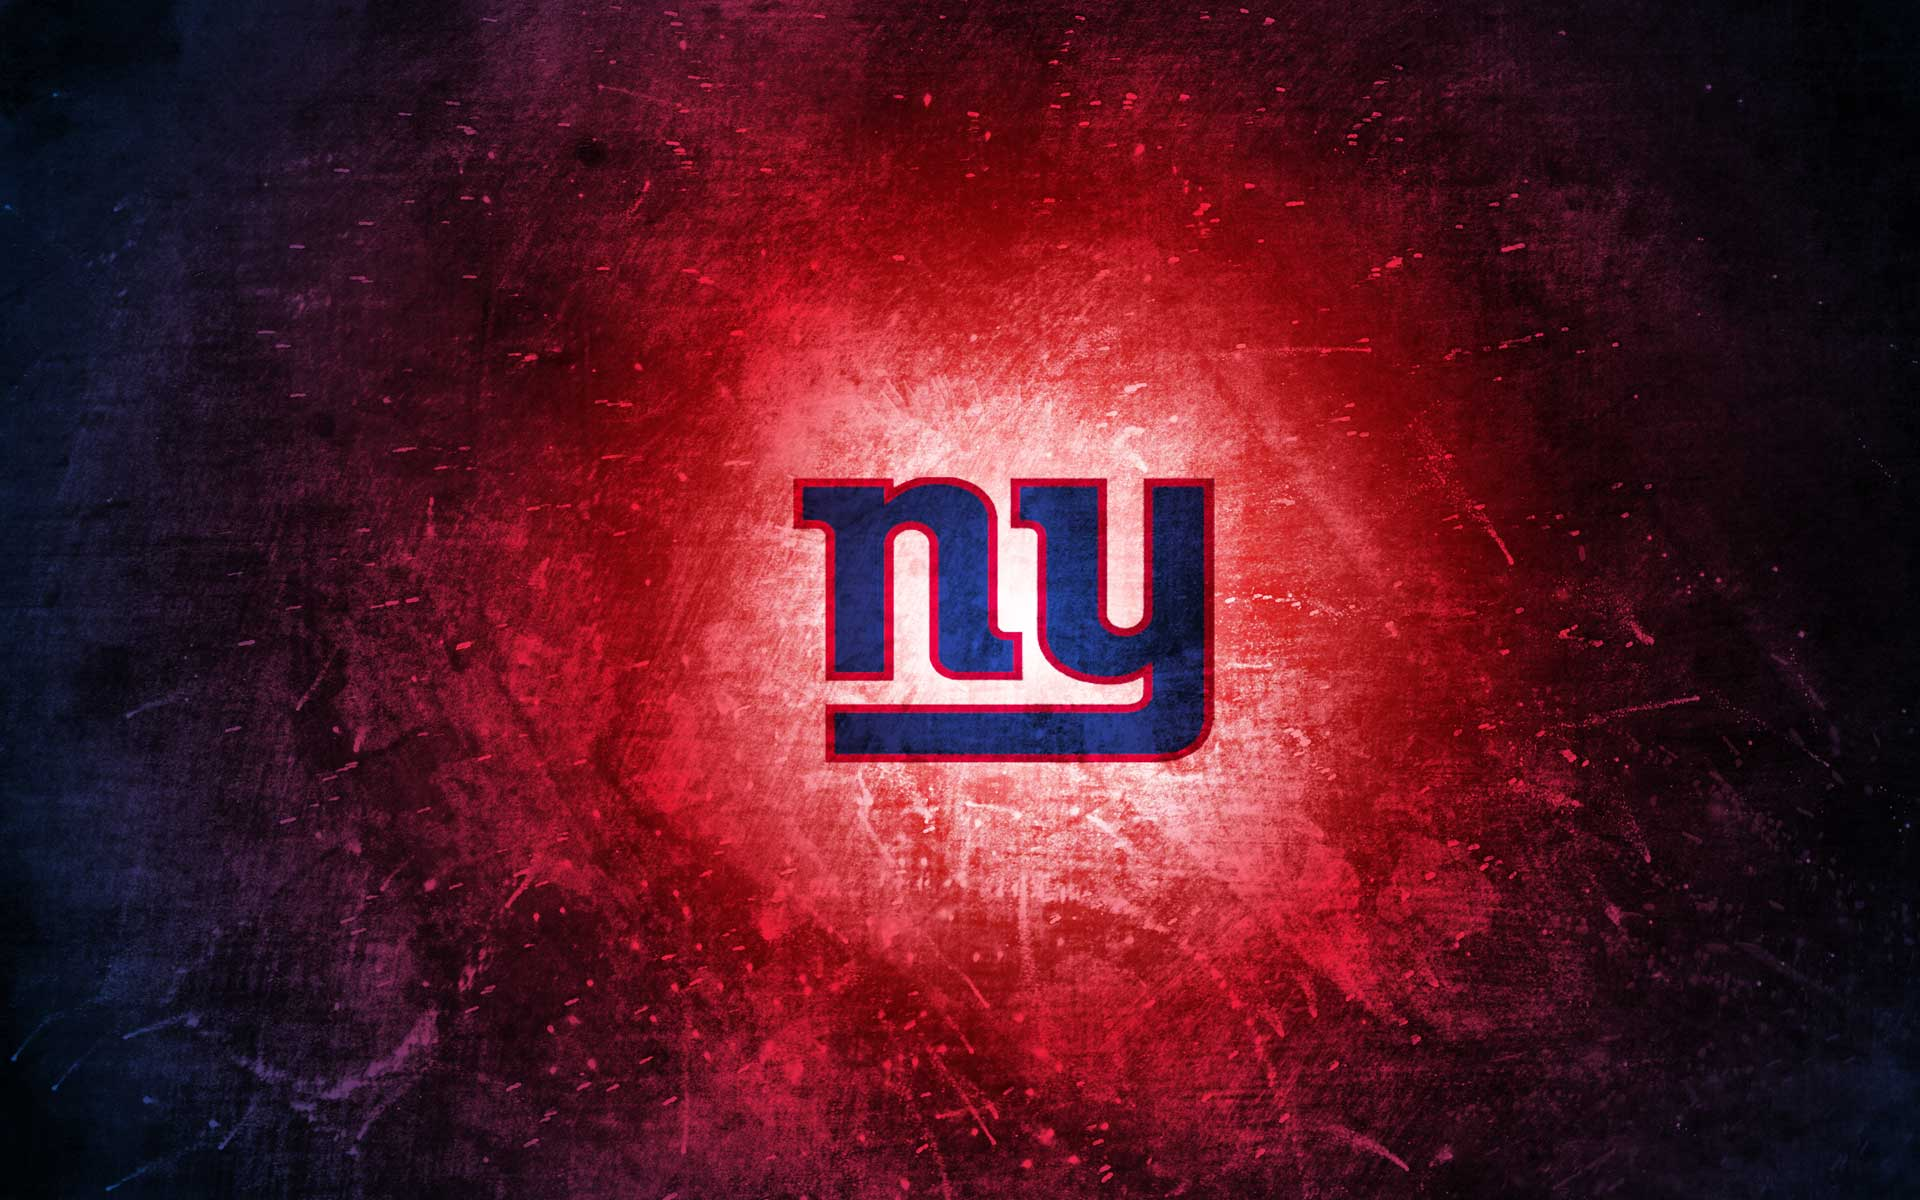 NY Giants Wallpaper And Screensaver